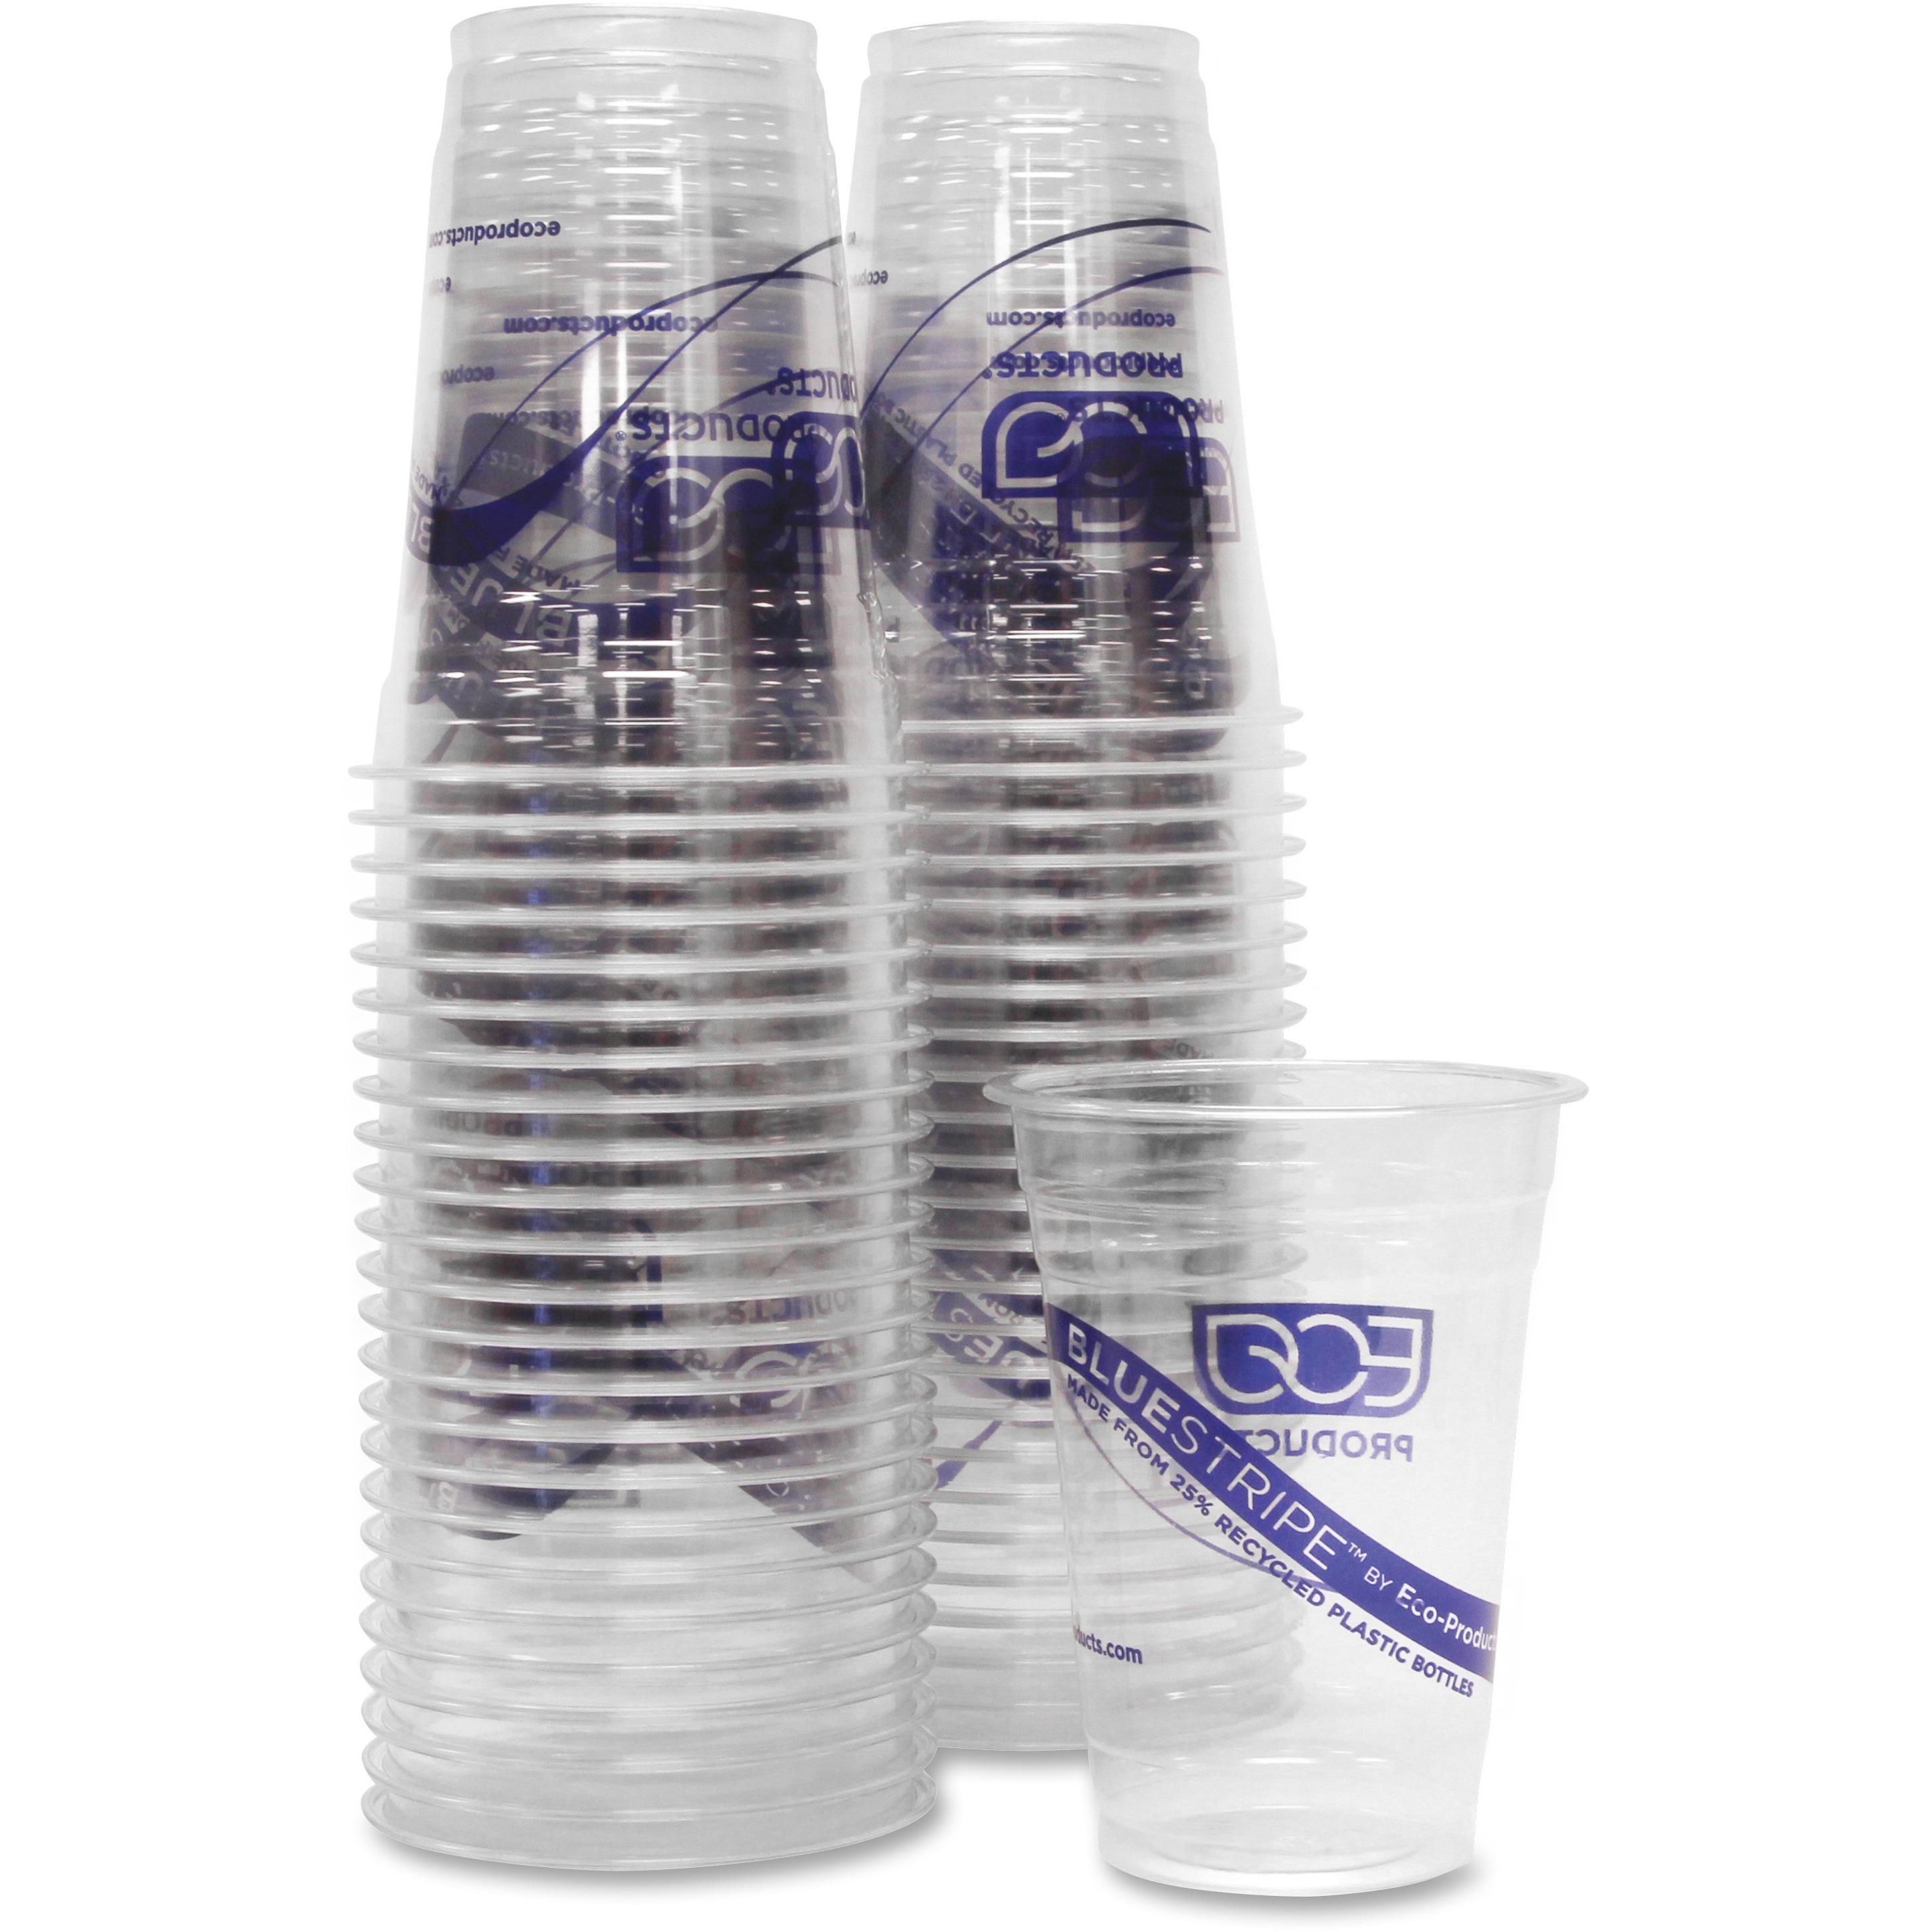 Eco-Products, ECOEPCR16, BlueStripe Cold Cups, 1000 / Carton, Clear, 16 fl oz